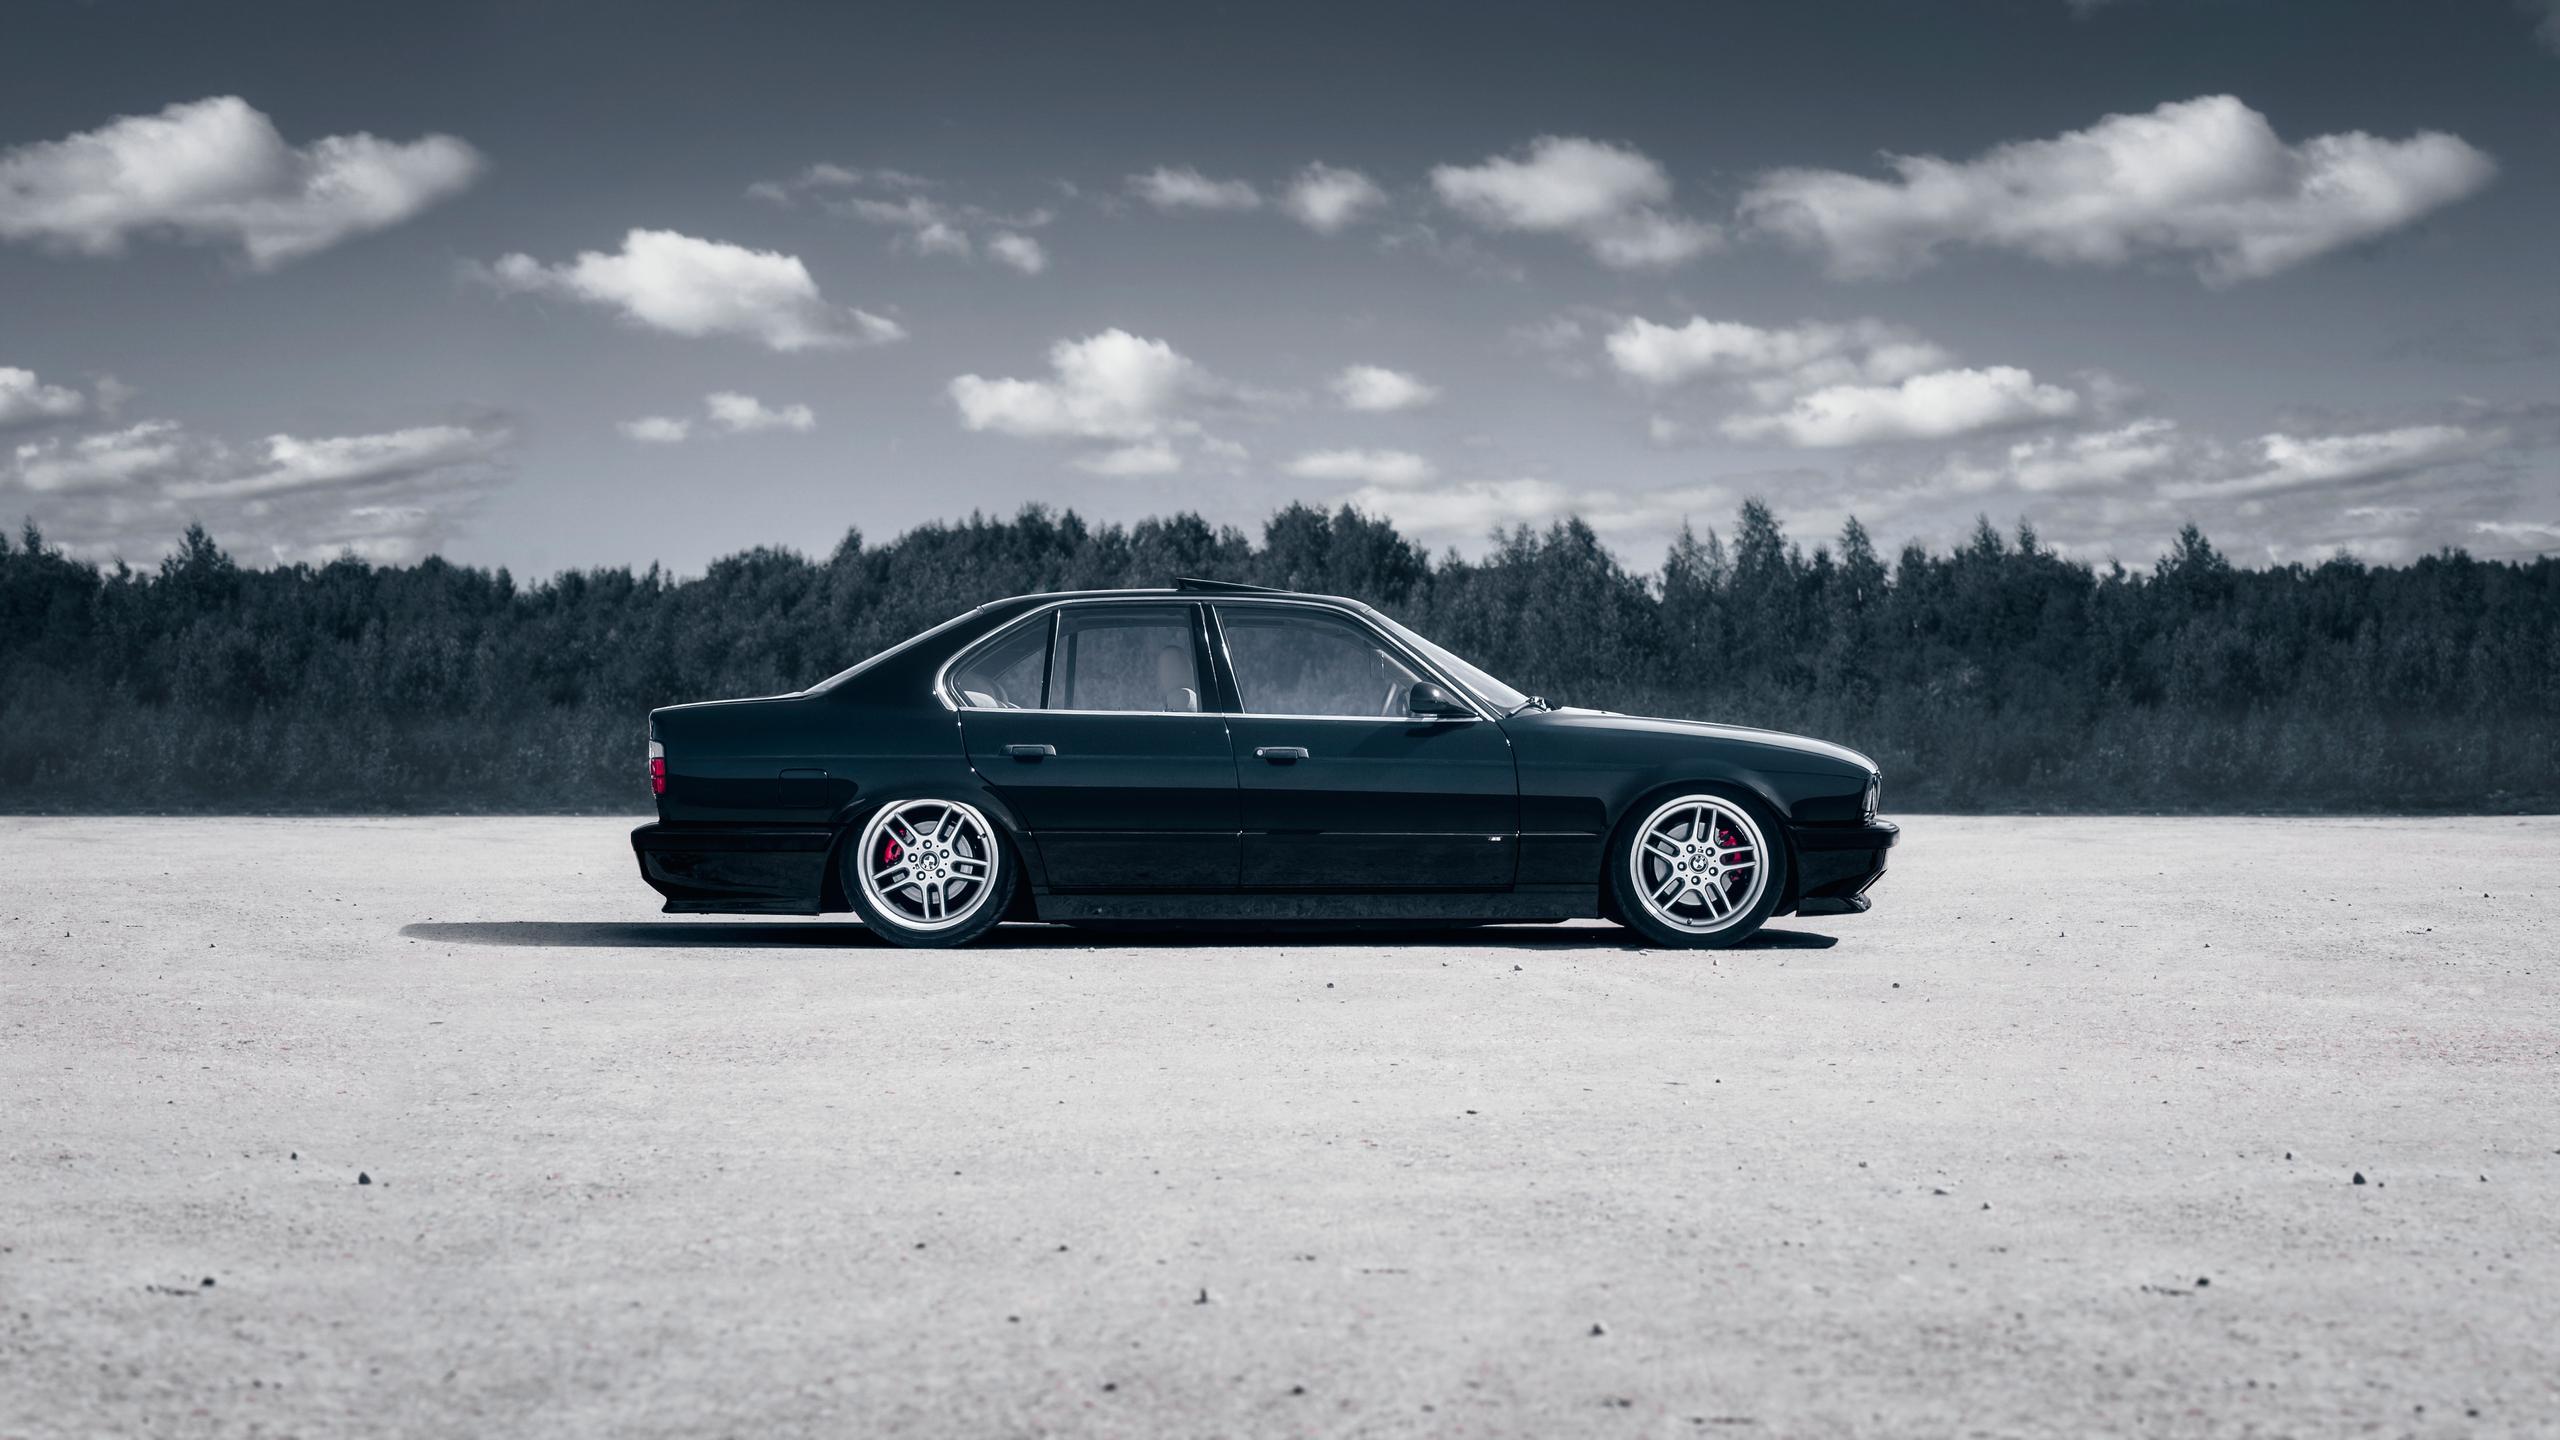 2560x1440 BMW 5 Series E34 5k 1440P Resolution HD 4k ...